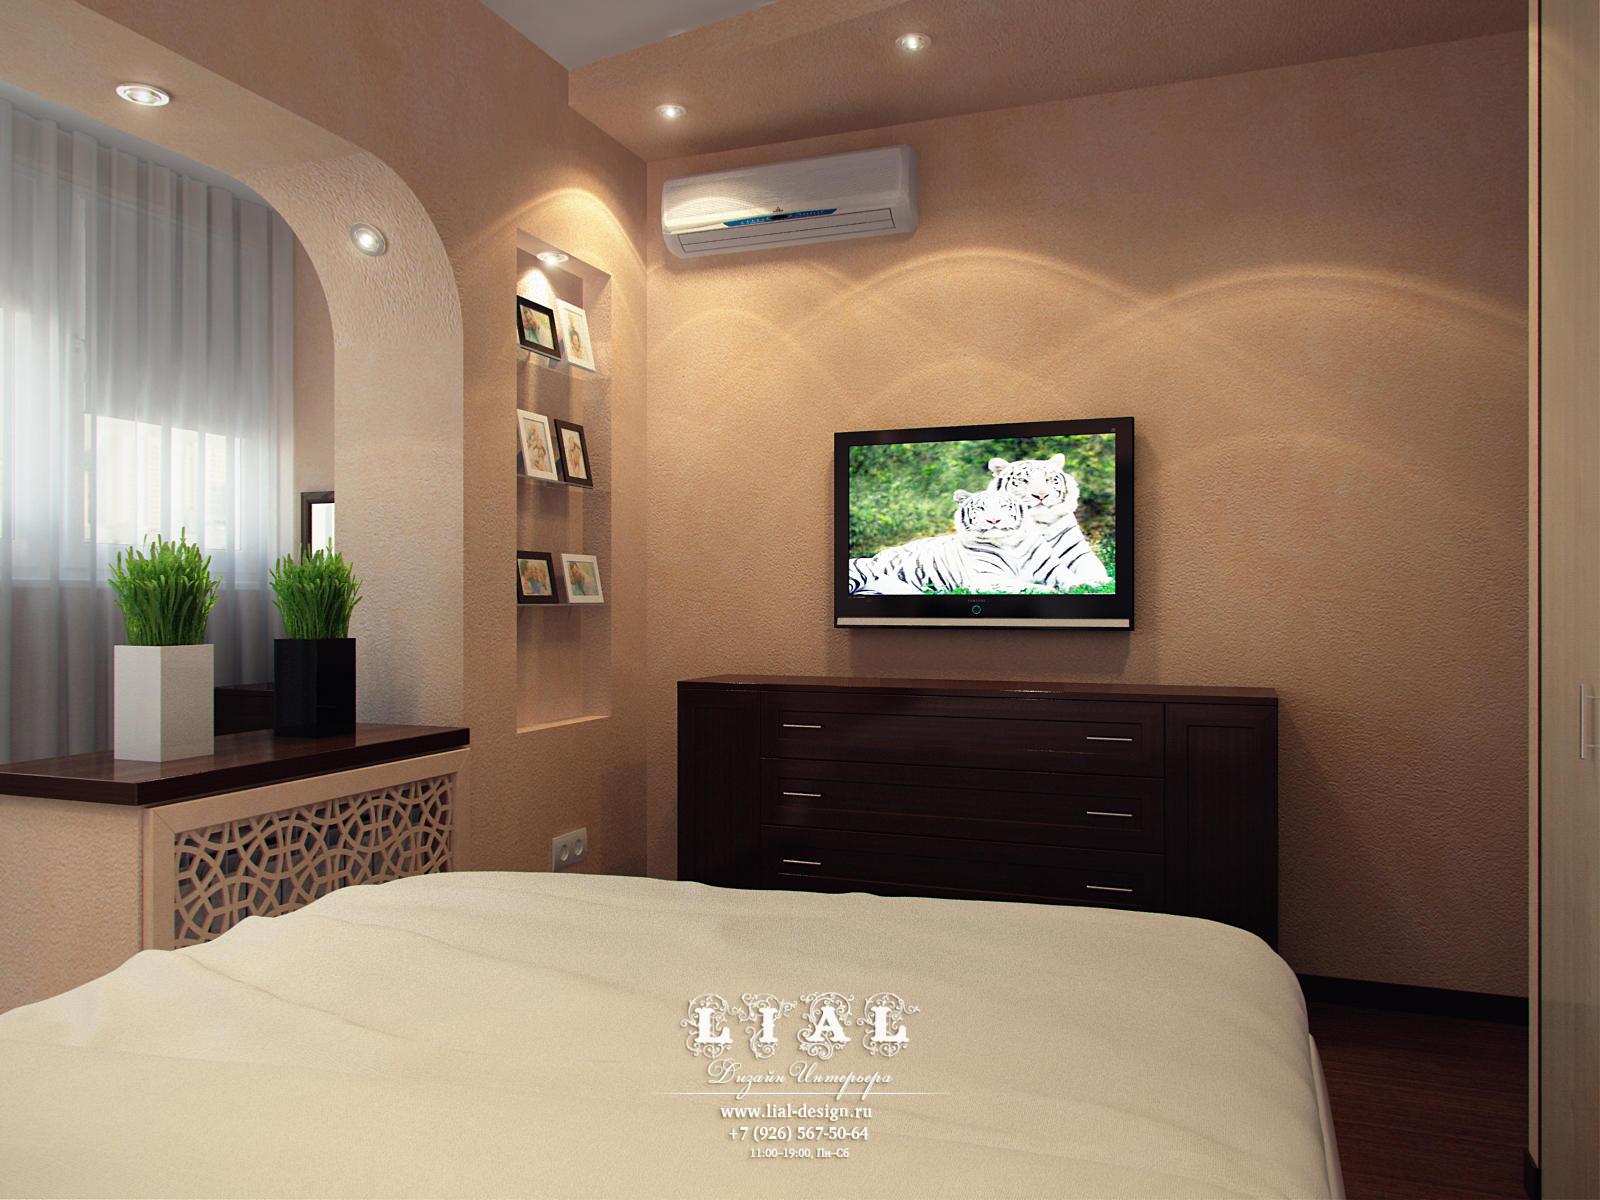 Дизайн спальни в квартире: фото и идеи 2016